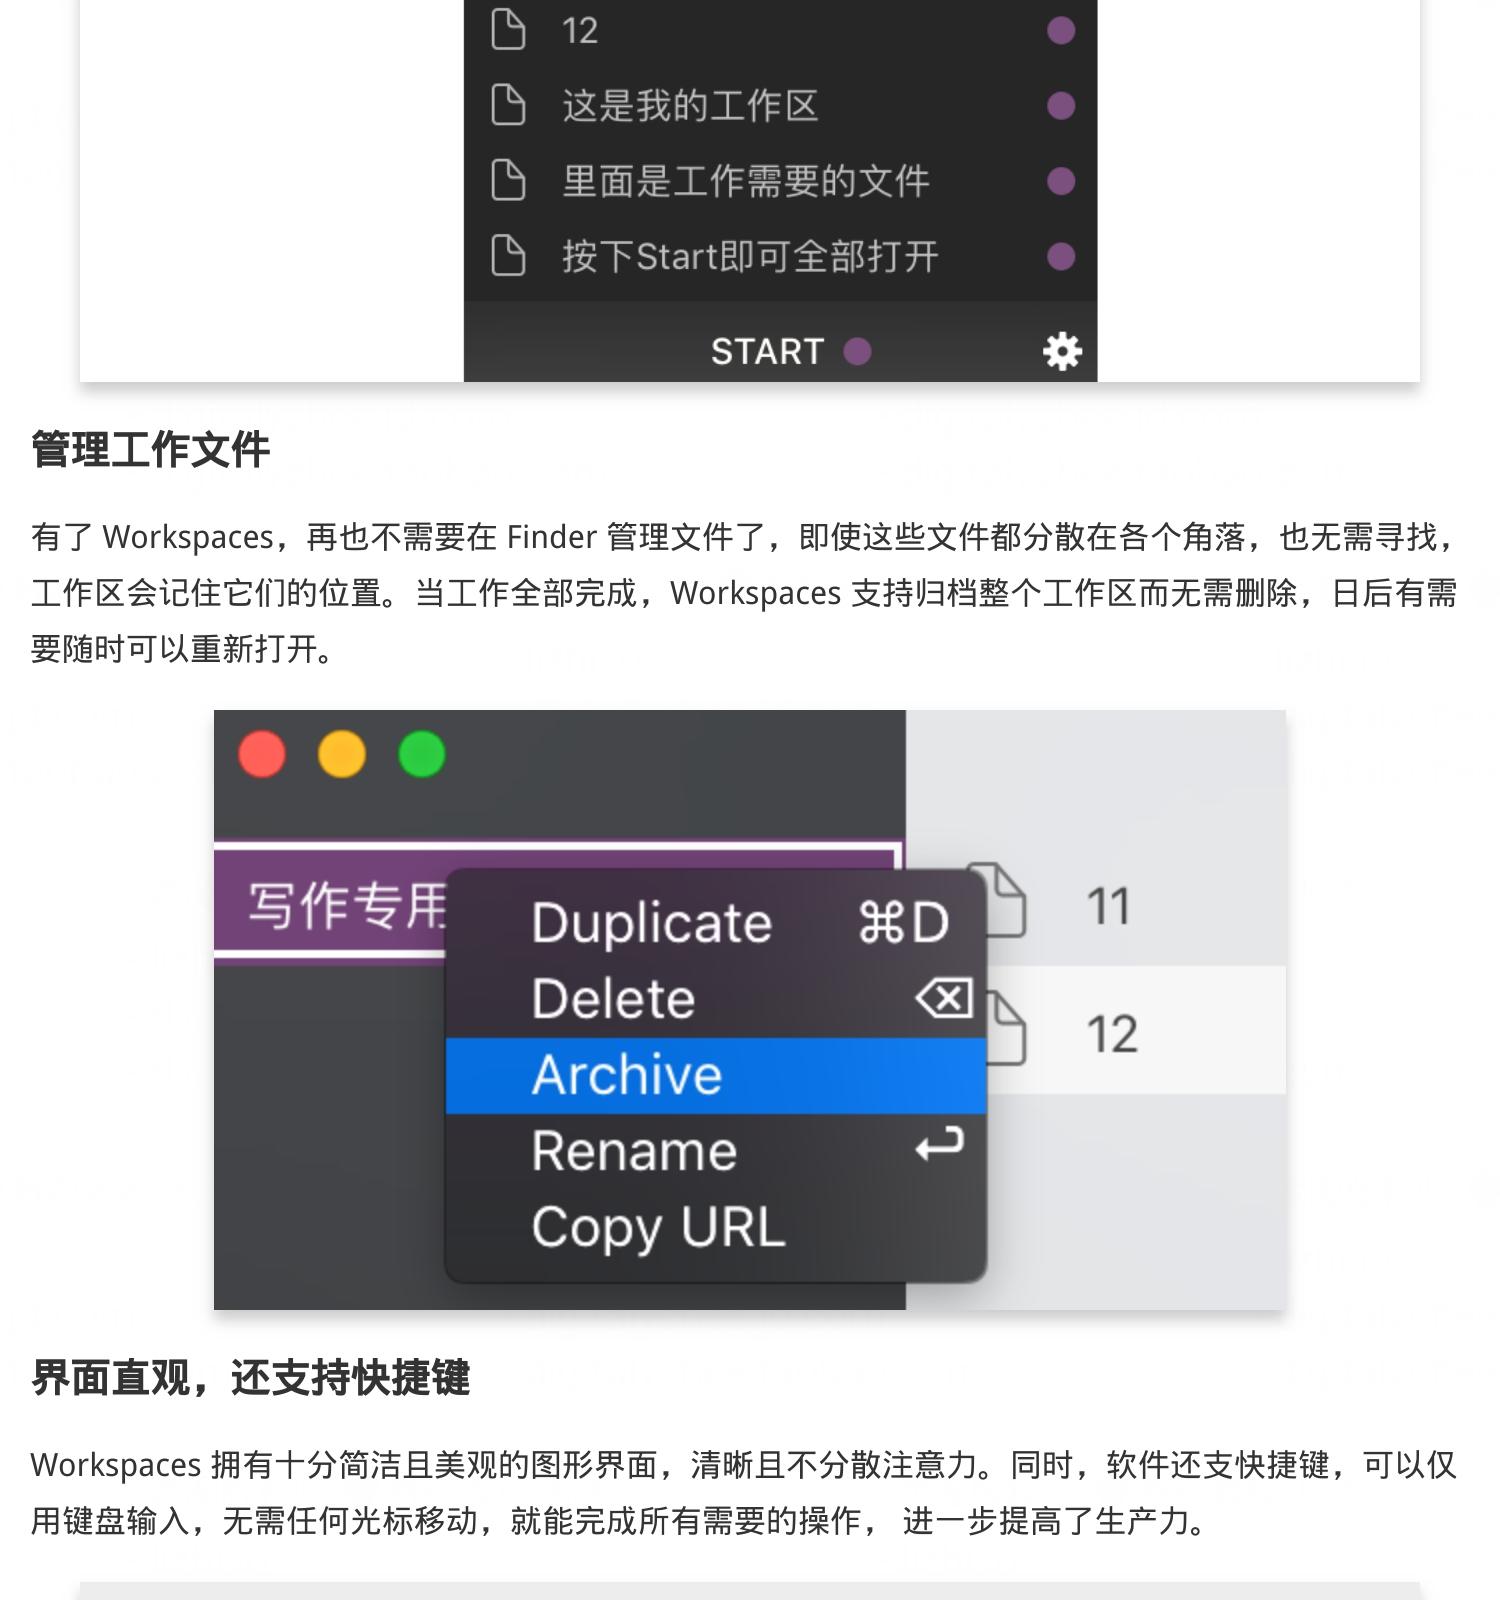 Workspaces Mac在一处聚合项目资源 支持多种格式类型